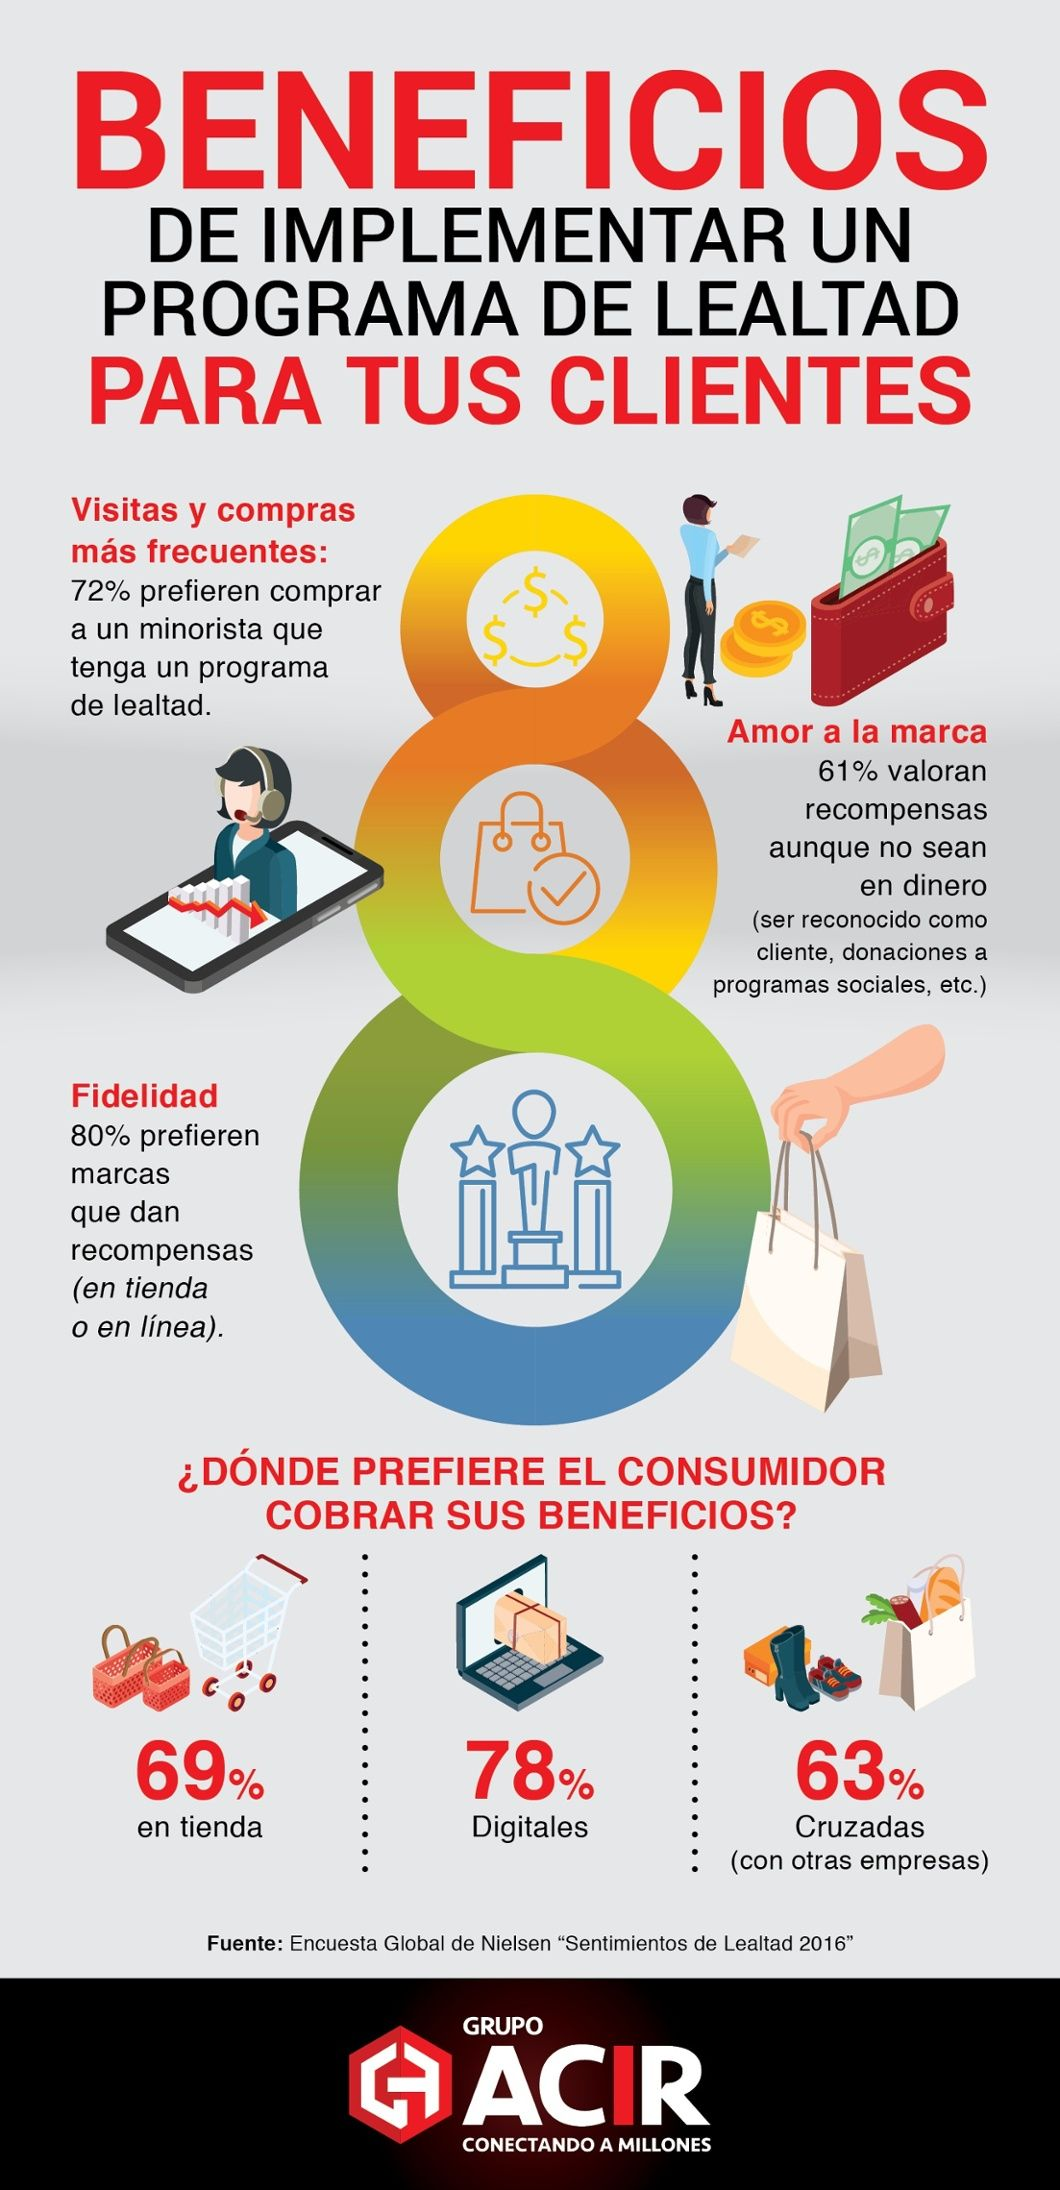 8 beneficios de implementar programas de fidelidad para tus clientes  #infografia #marketing